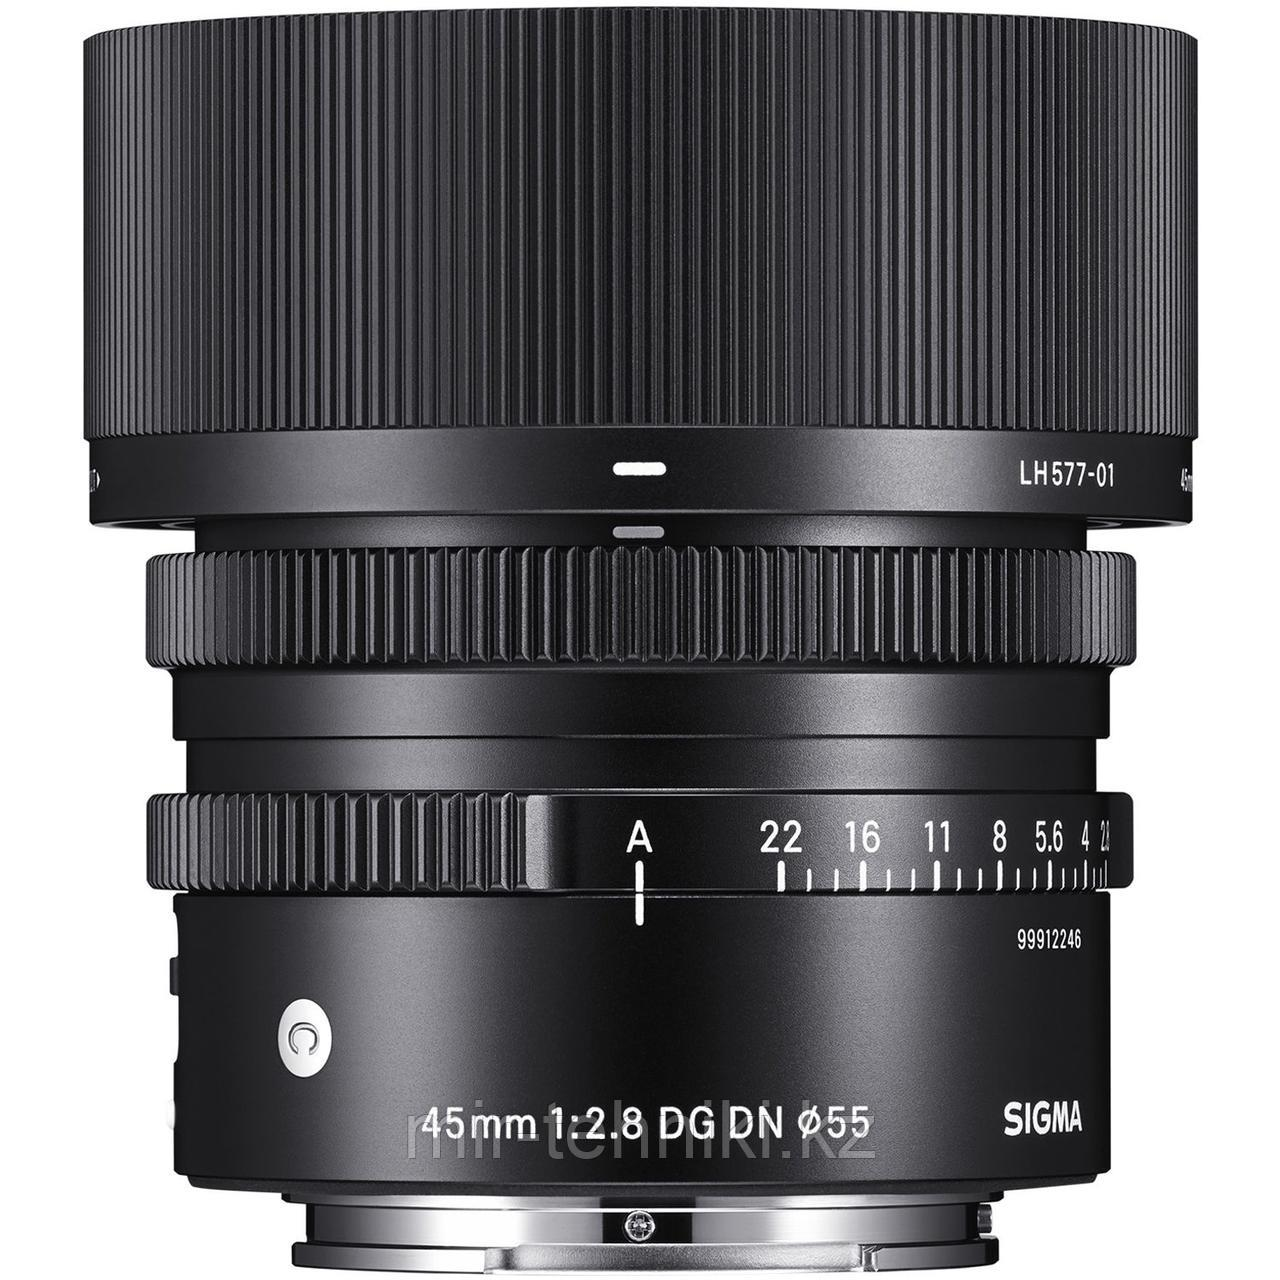 Sigma 45mm F/2.8 DG DN Contemporary Sony